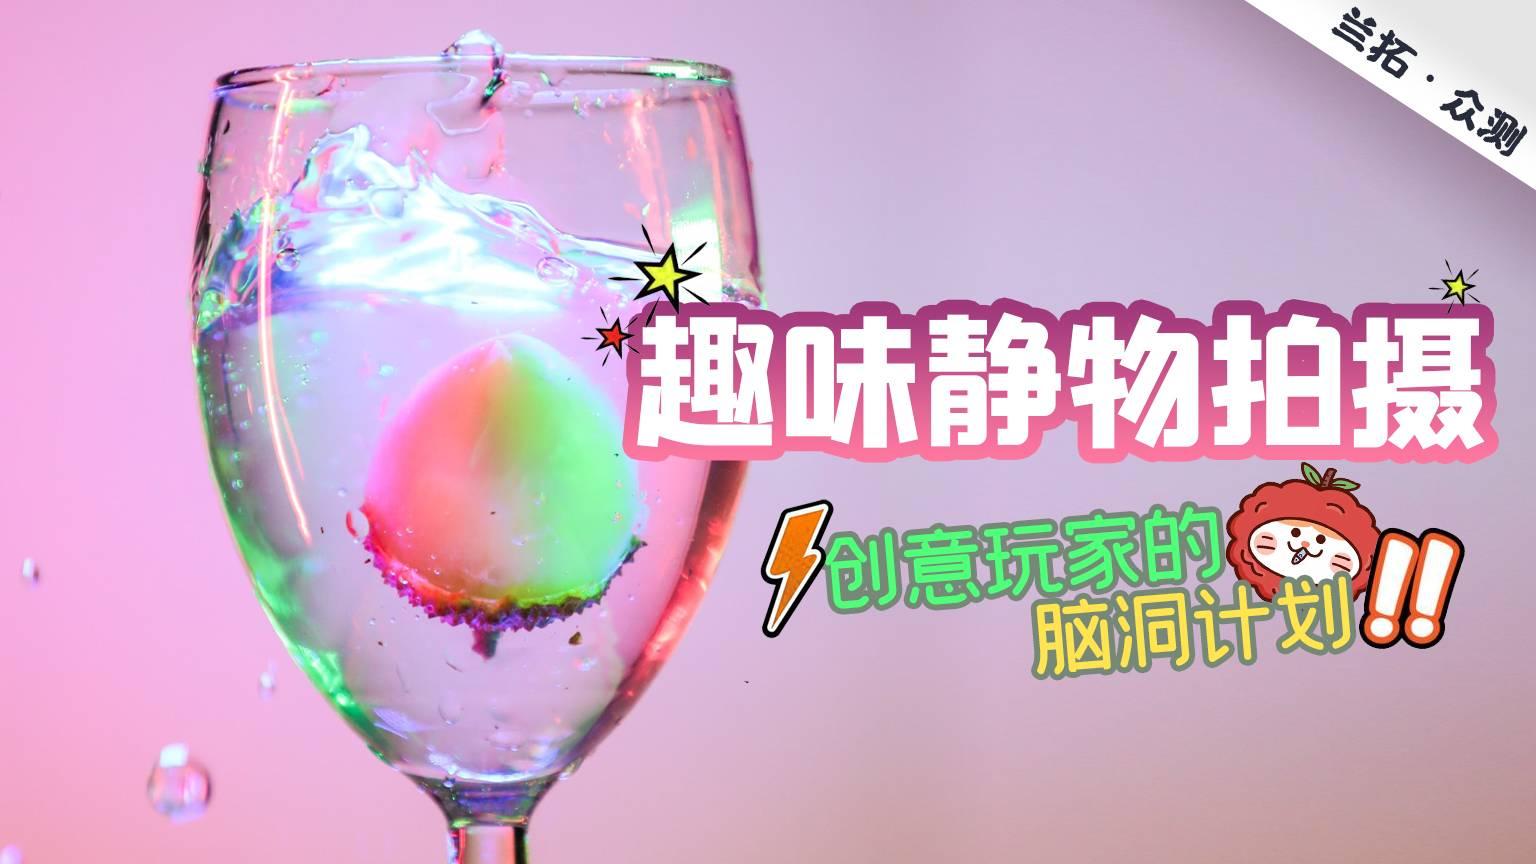 【iwata Master R全彩灯】预设玩得好,一根灯管用到老!—— By 呆呆的阿登